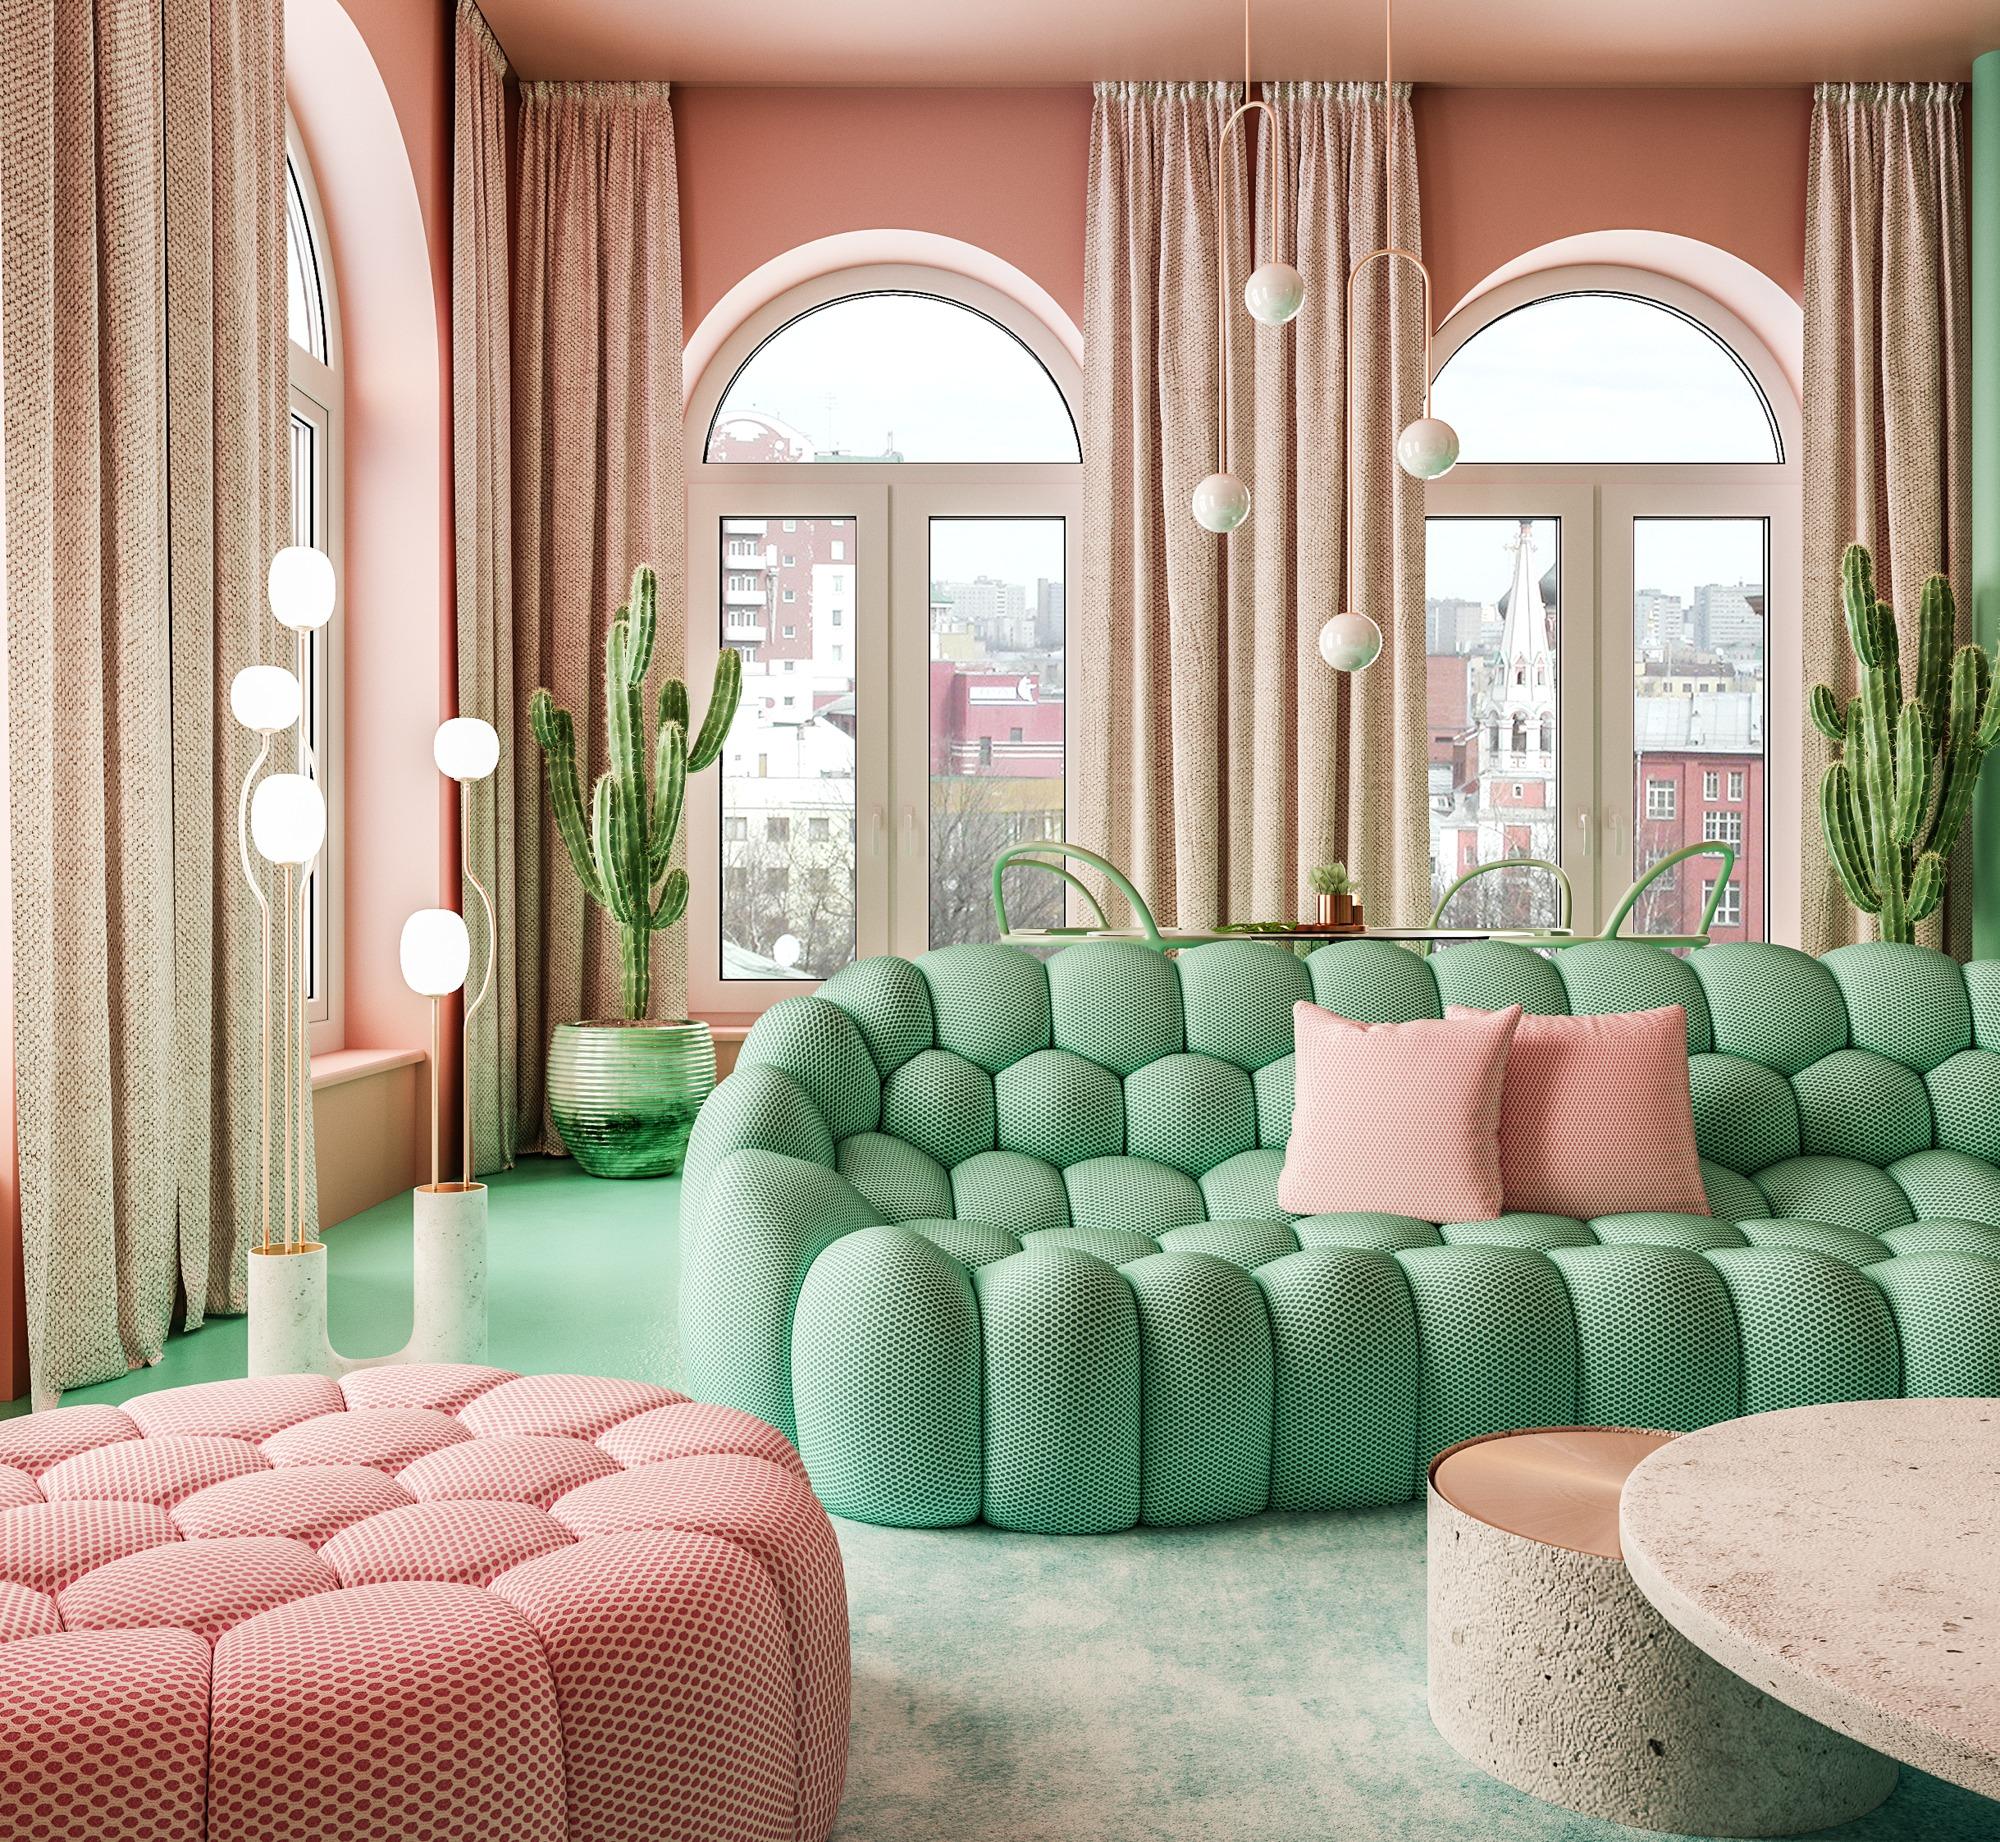 Apartment New York / Reutov Design  ArchDaily